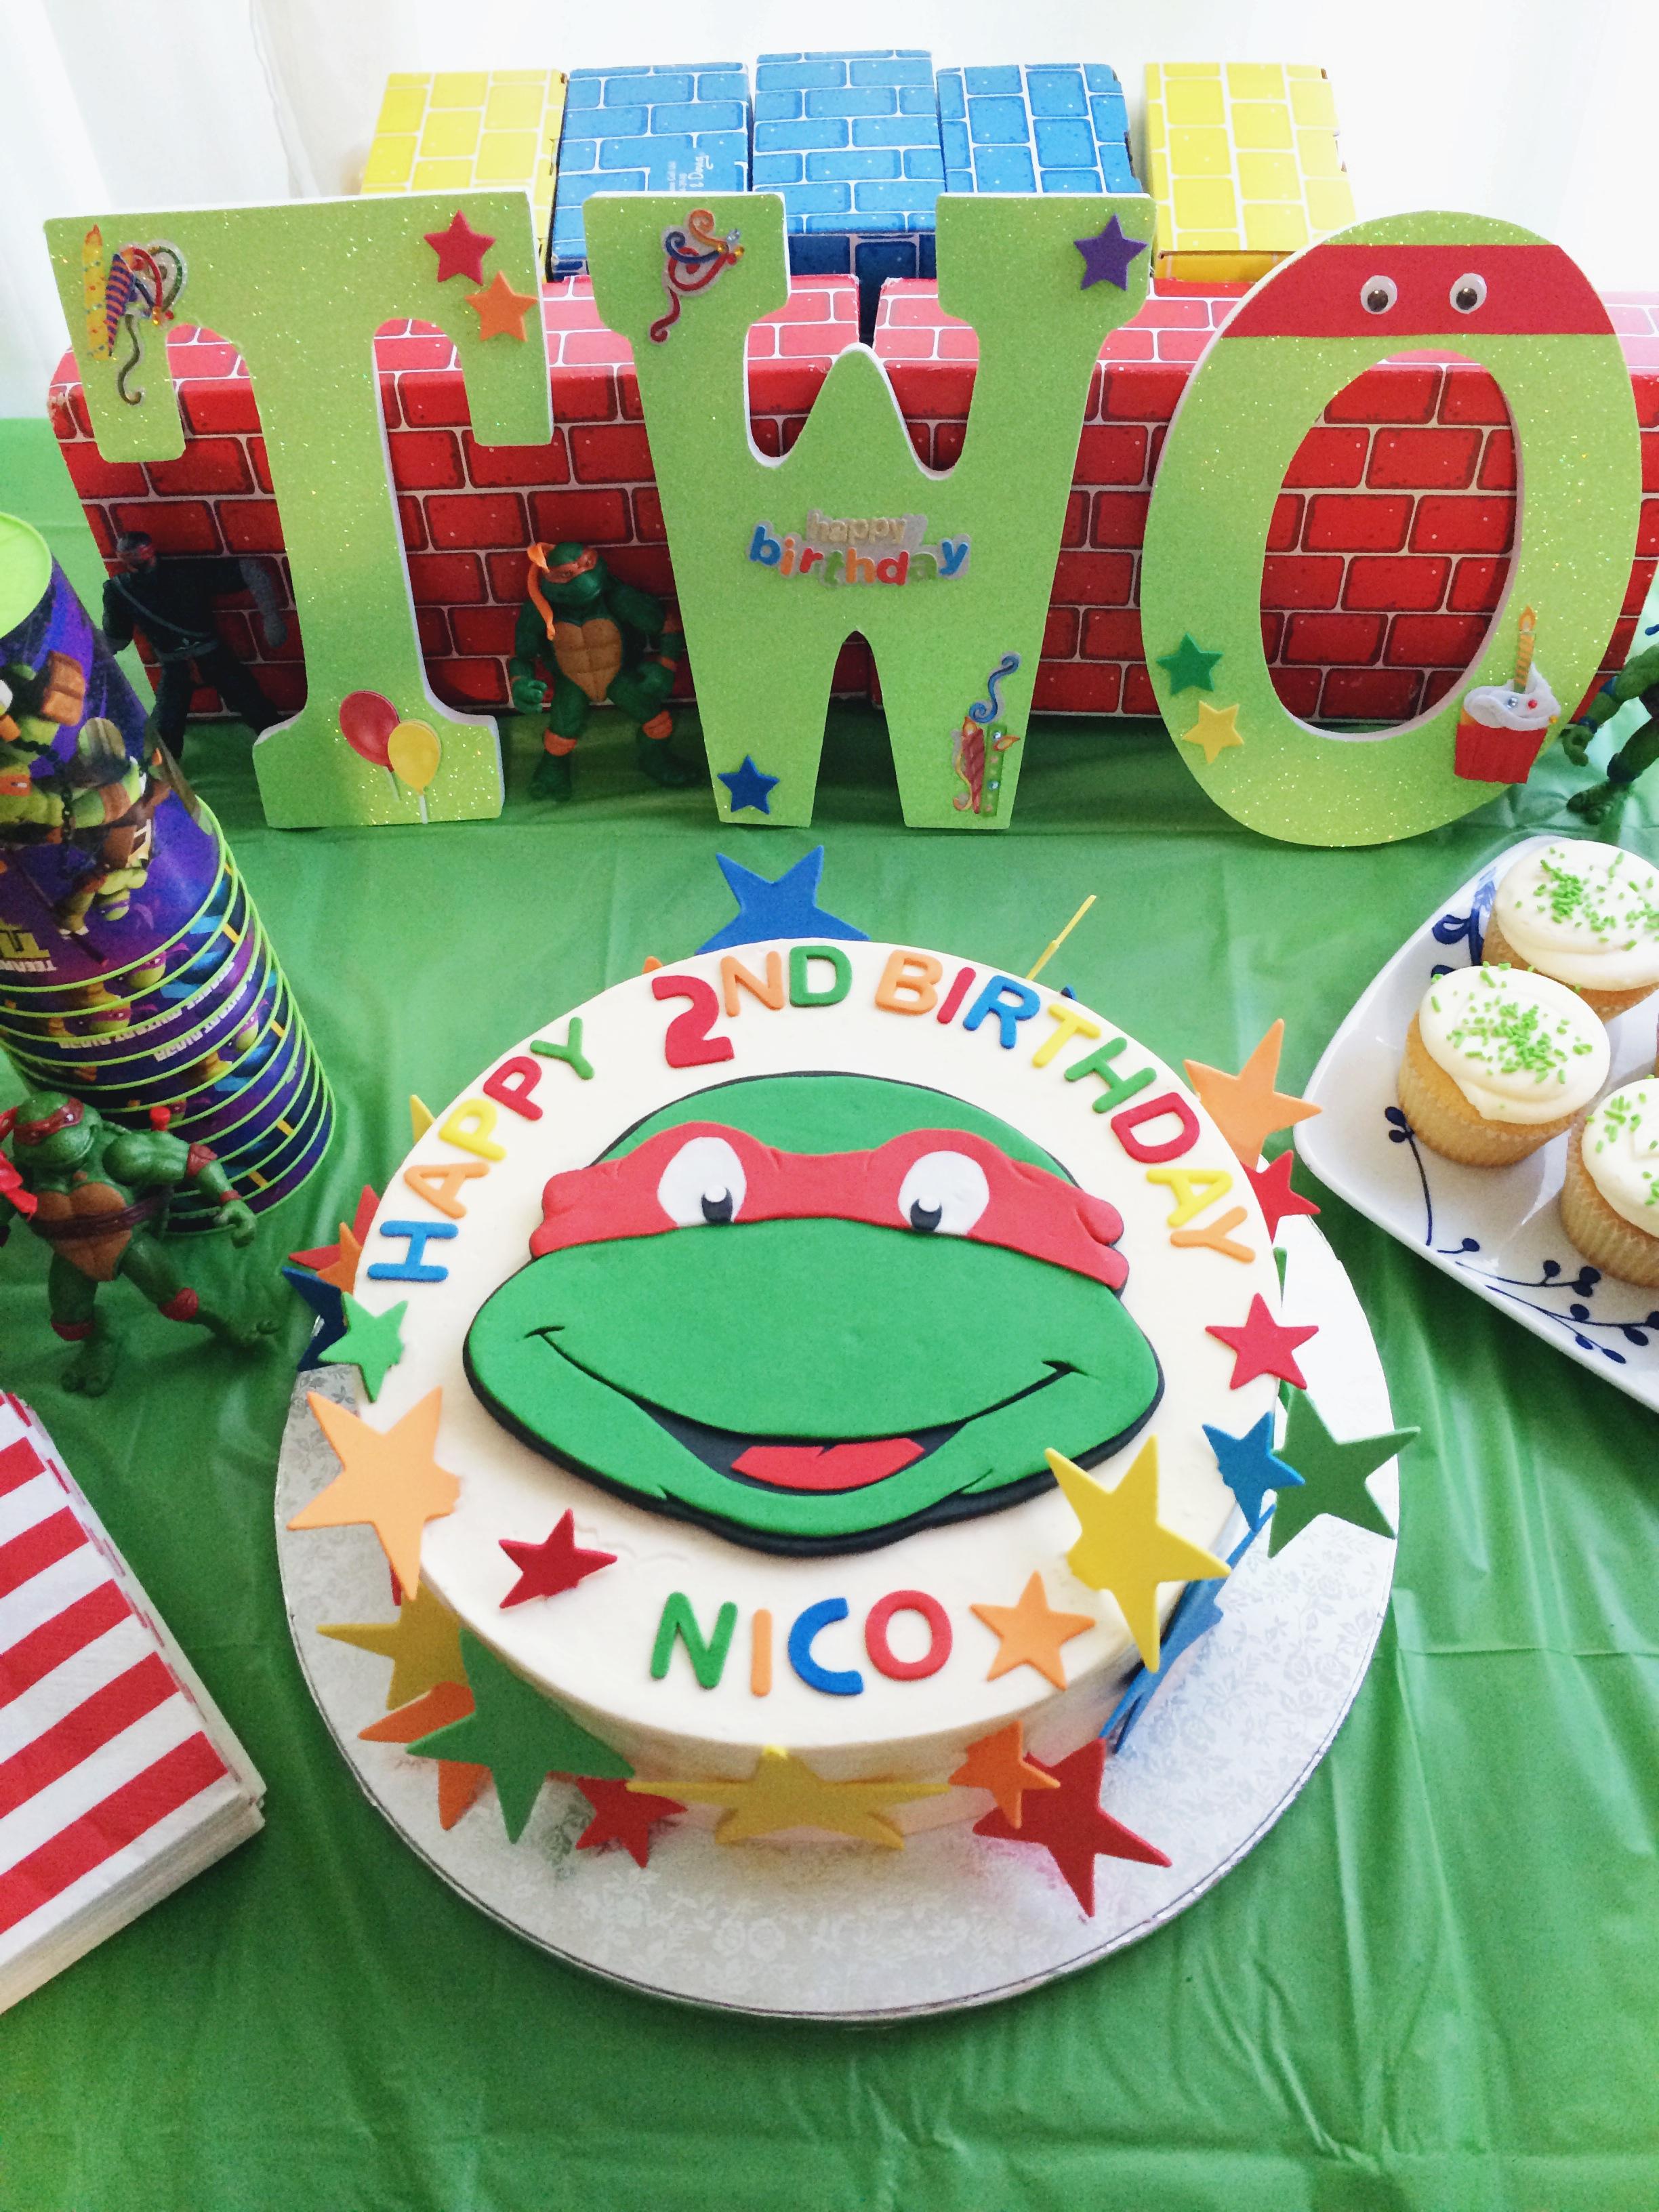 Outstanding Teenage Mutant Ninja Turtle Cake Archives Popcorn And Pandas Personalised Birthday Cards Petedlily Jamesorg